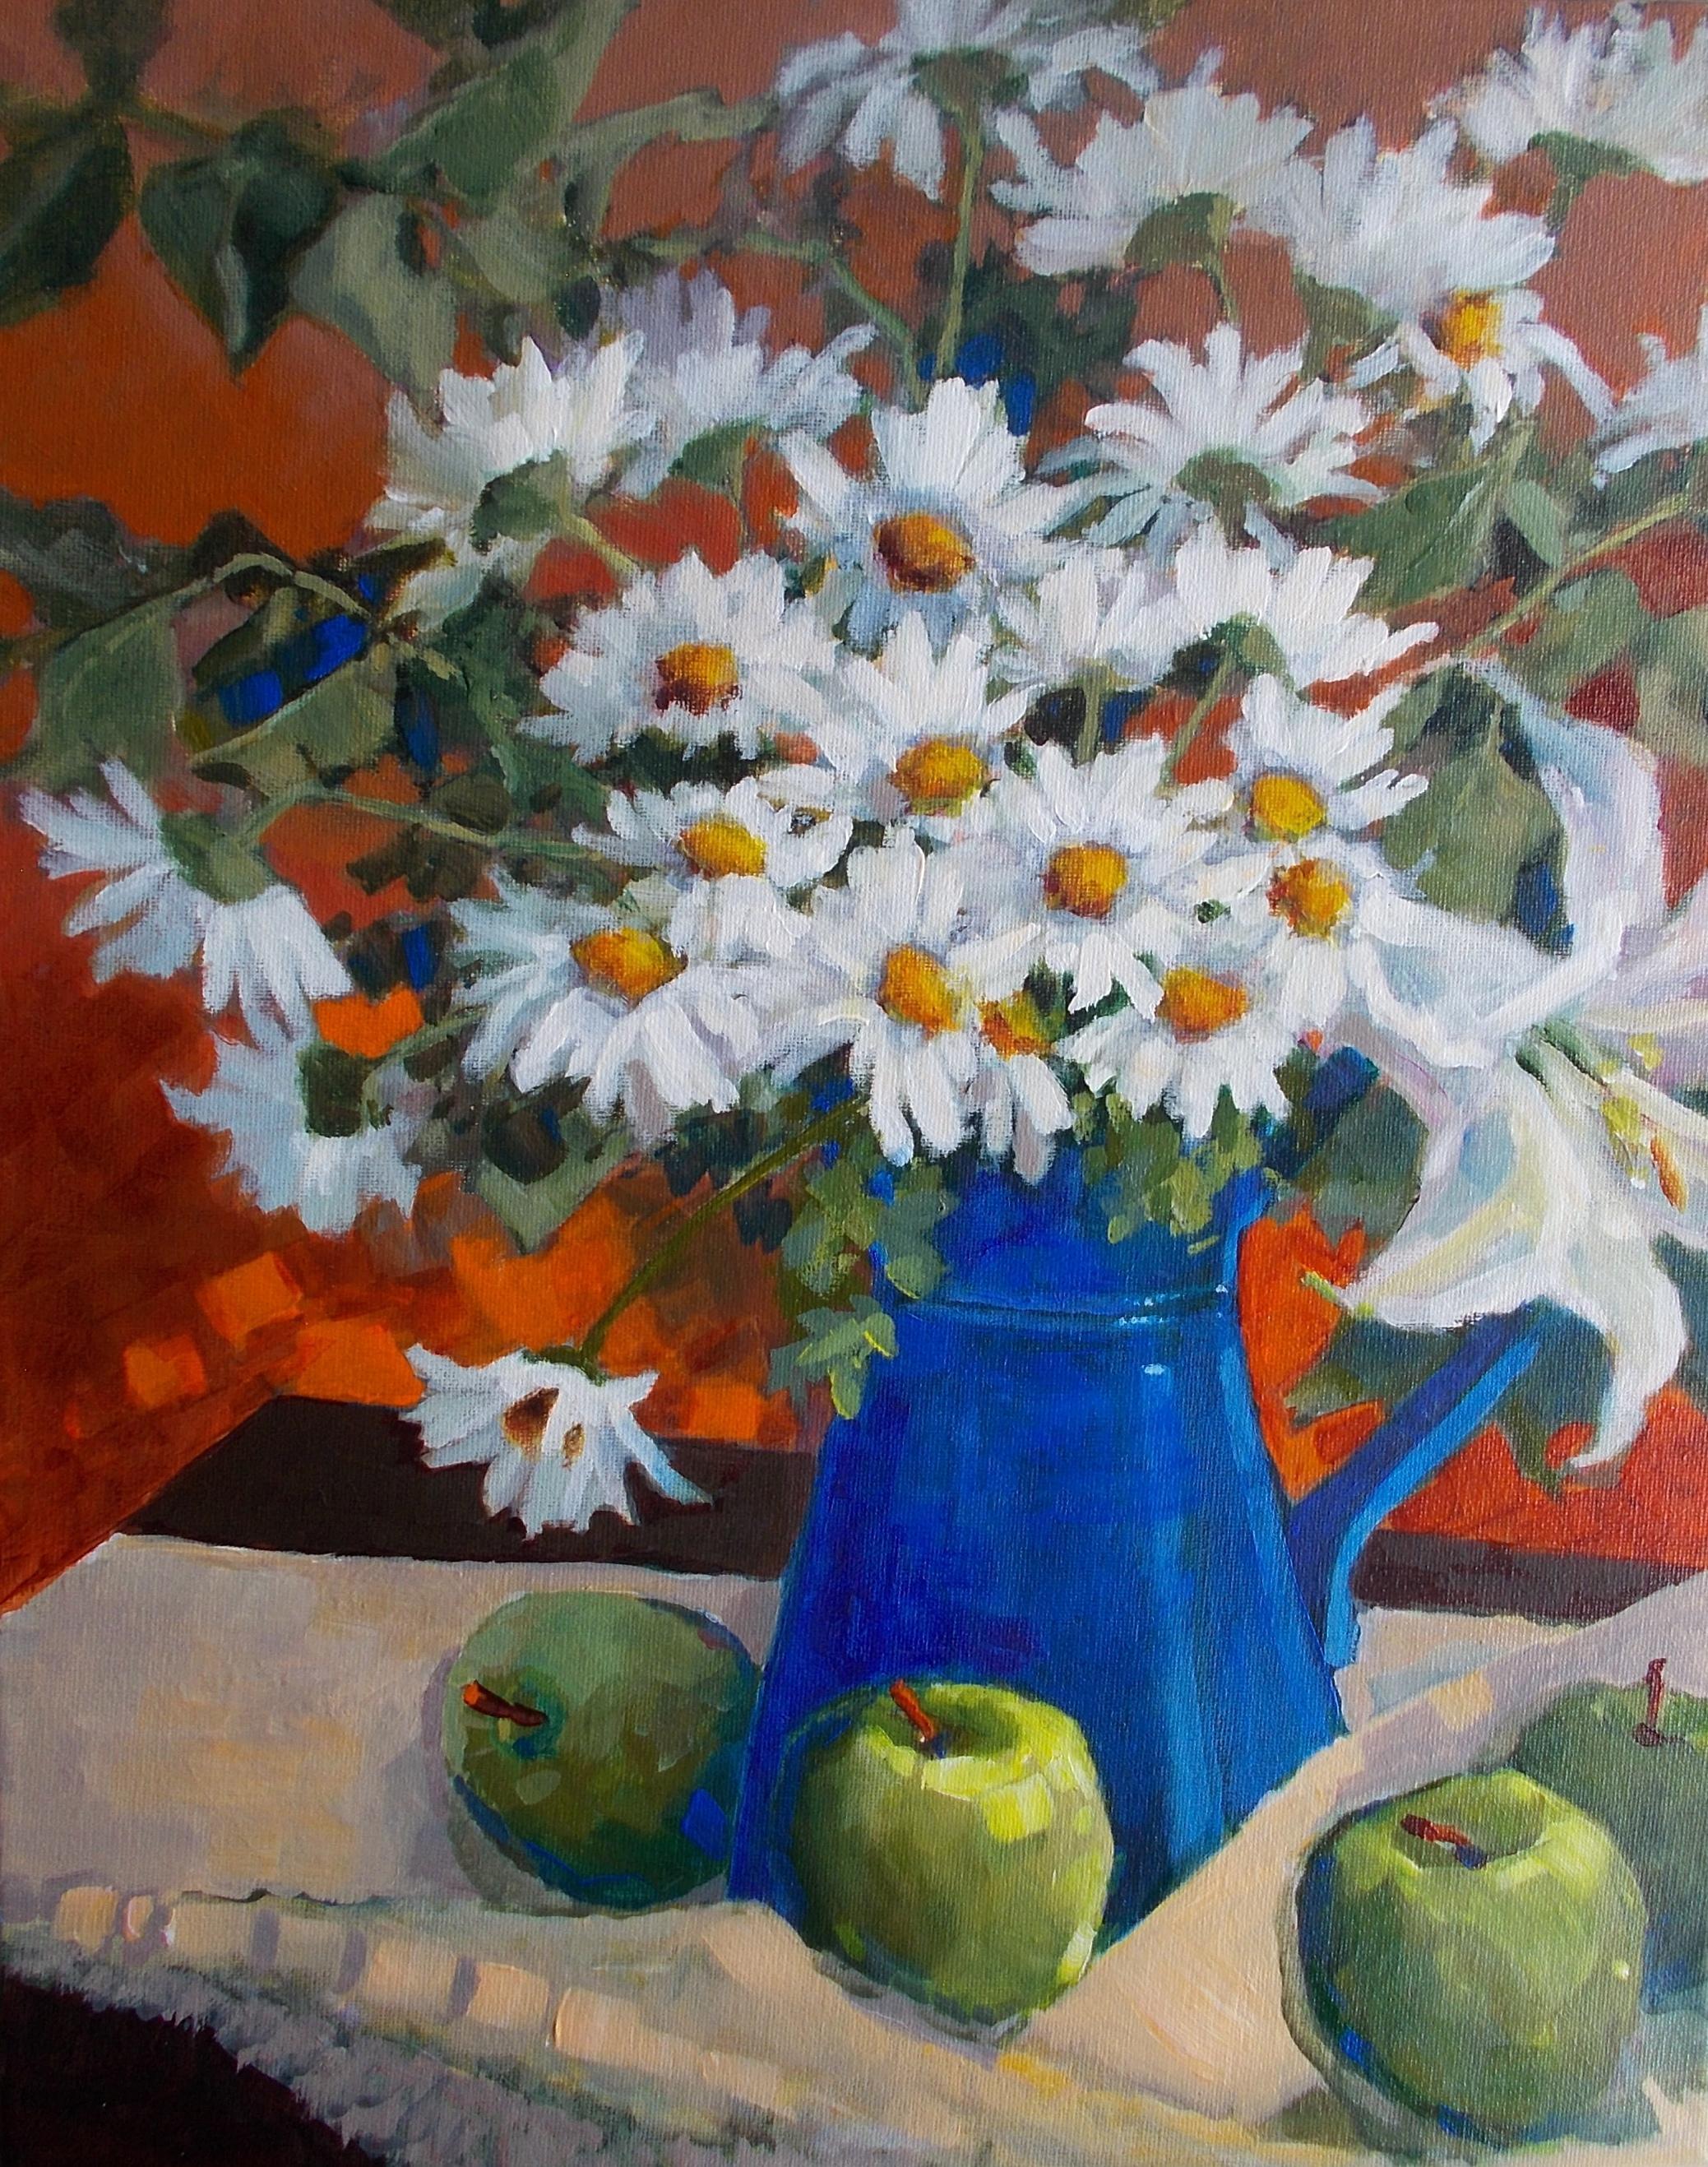 Sharyn Olfert - Daisy Time